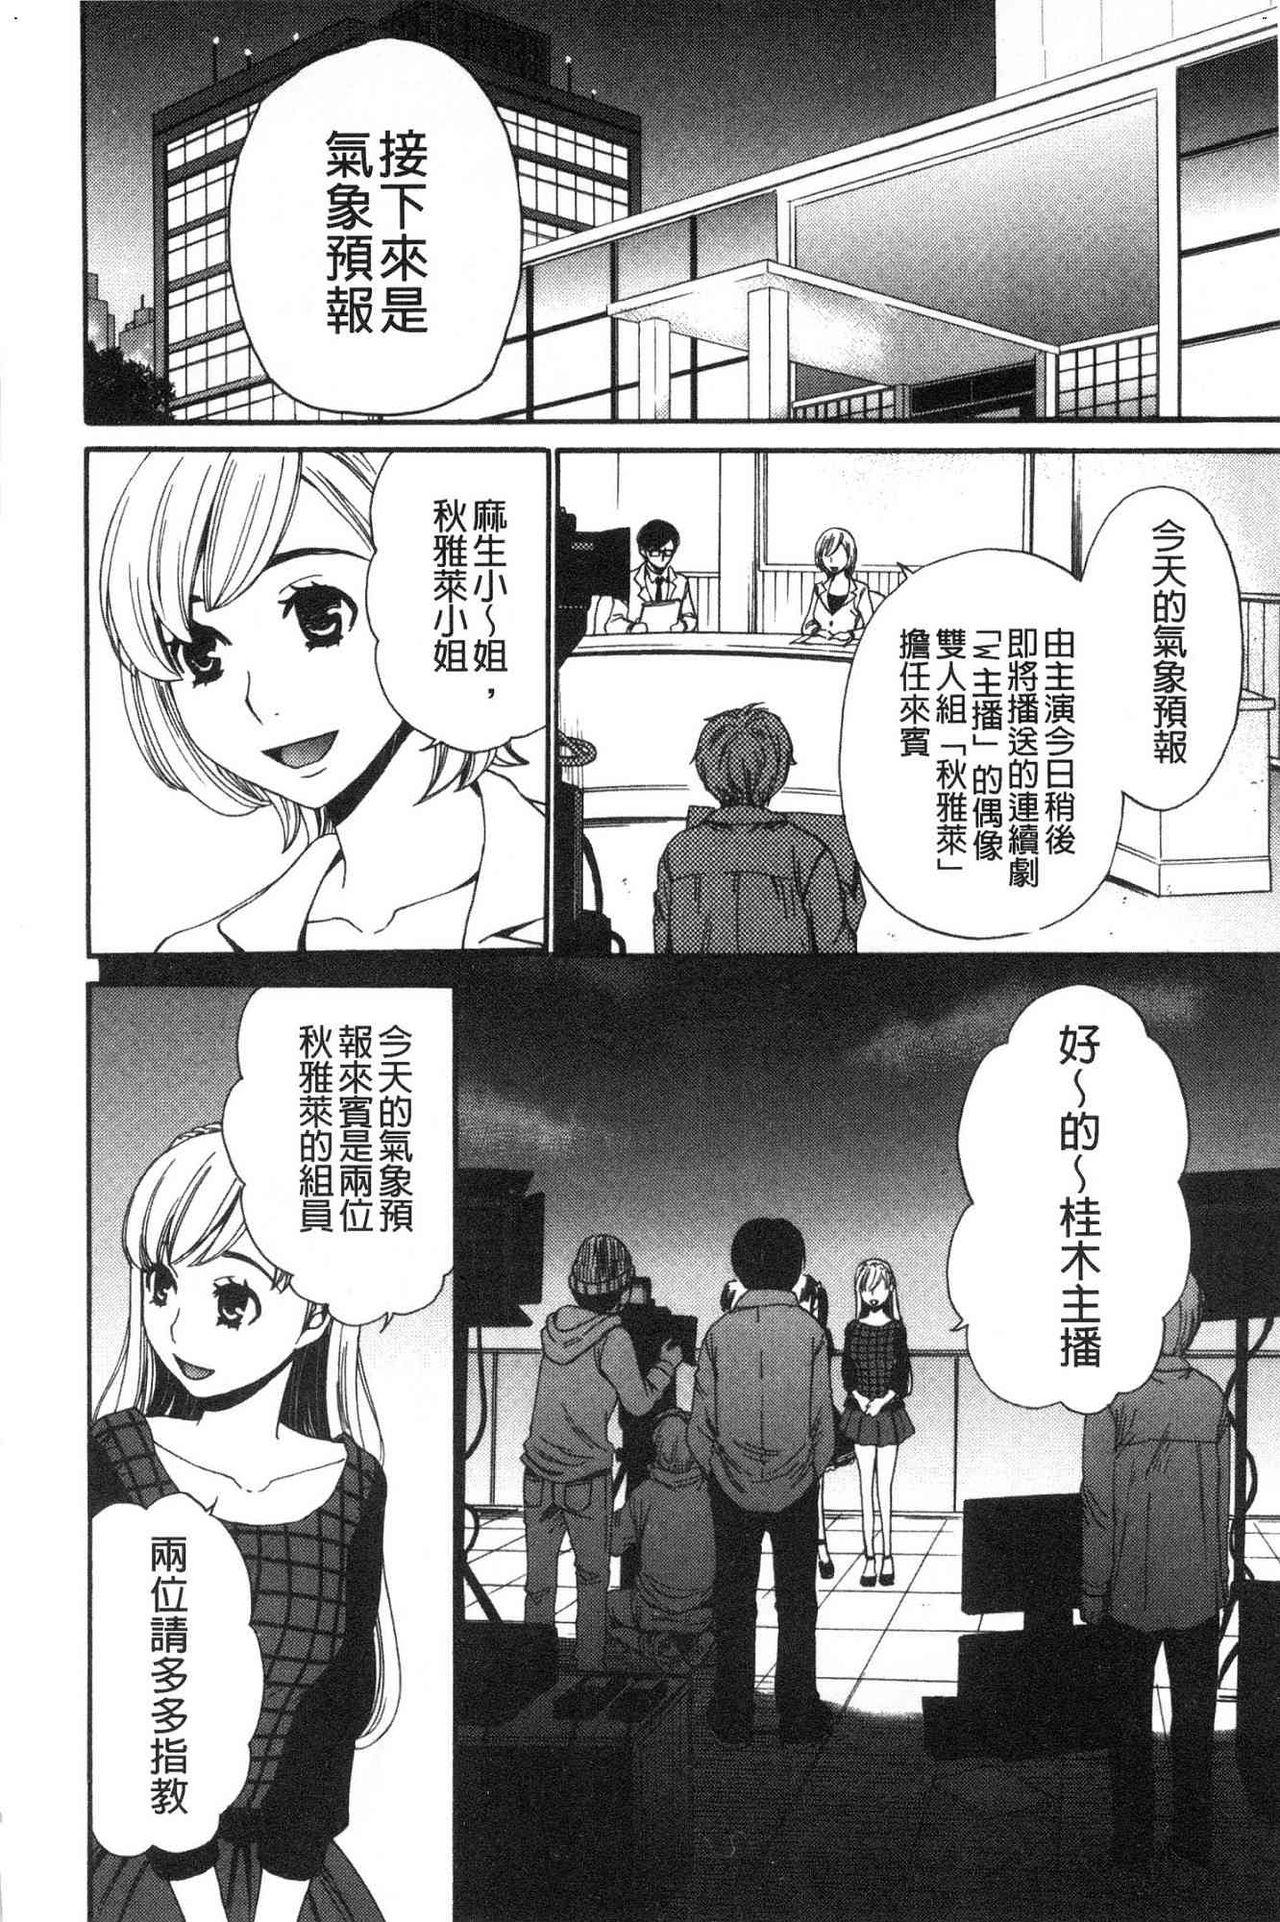 [Gotoh Akira]  21-ji no Onna ~Camera no Mae no Mesuinu~ 2 | 21時之女 ~鏡頭前的牝犬~ 2 [Chinese] 43